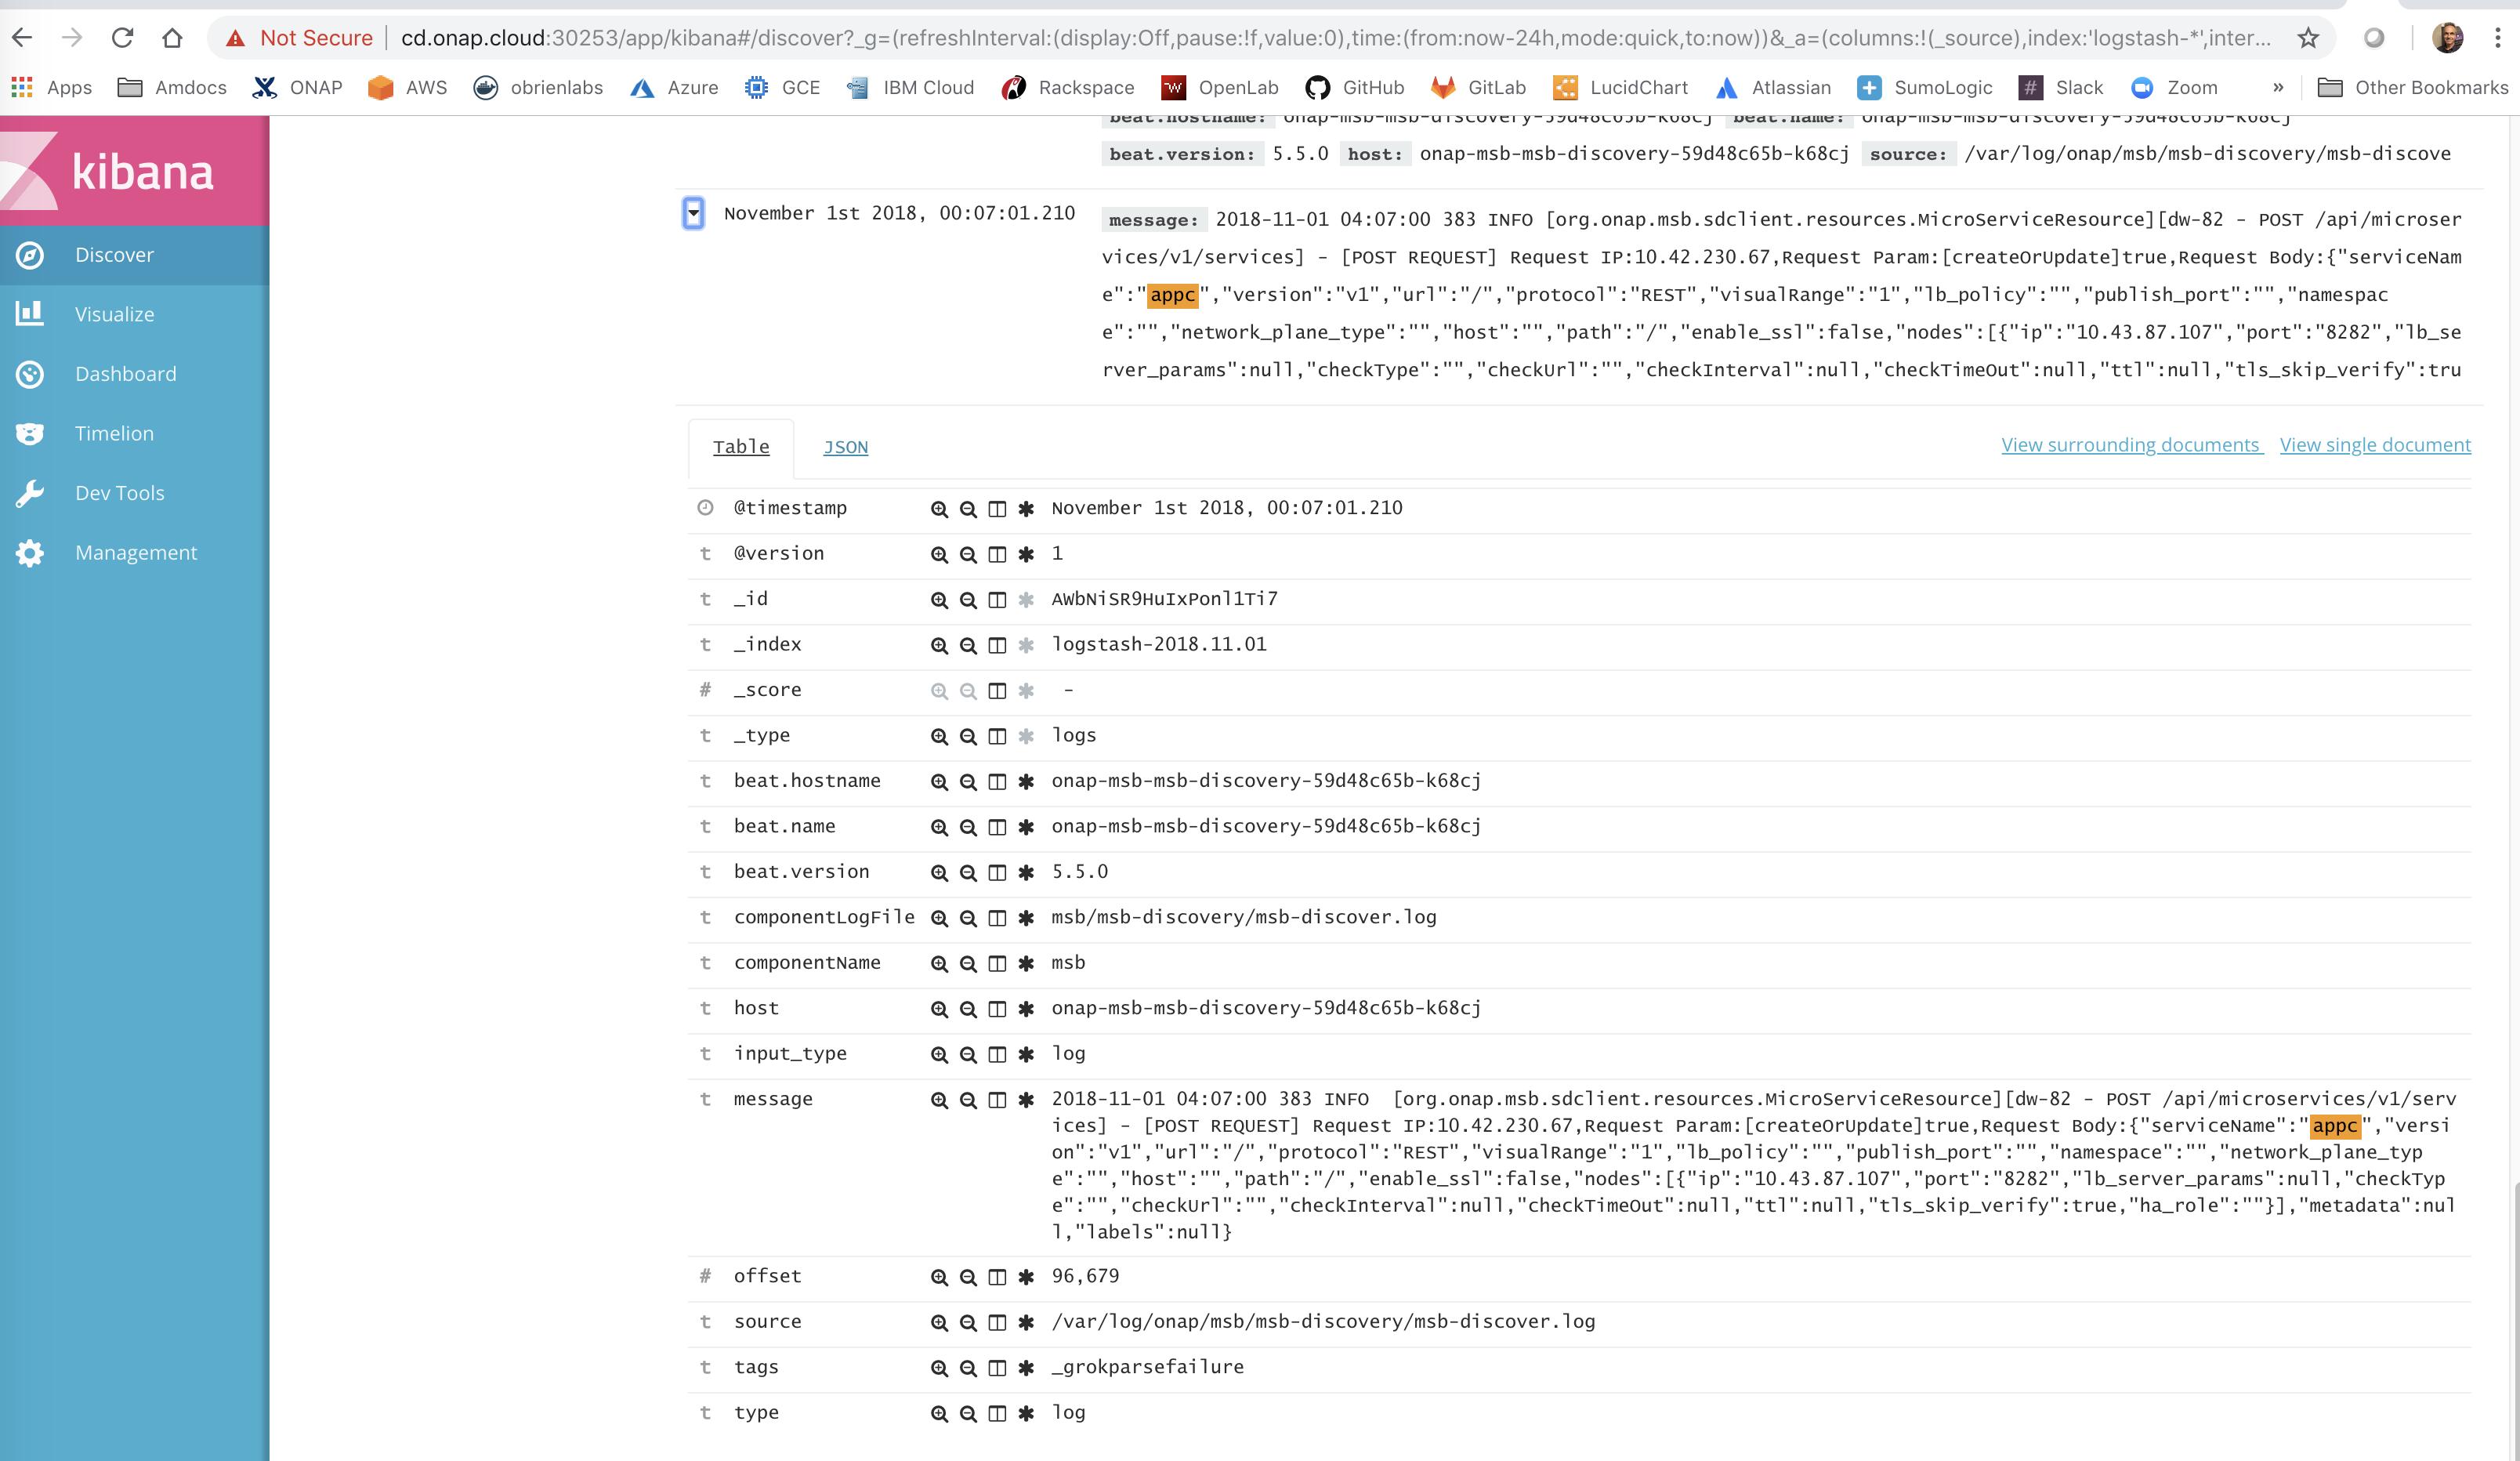 Logging Pair Wise Testing for Casablanca Release - Developer